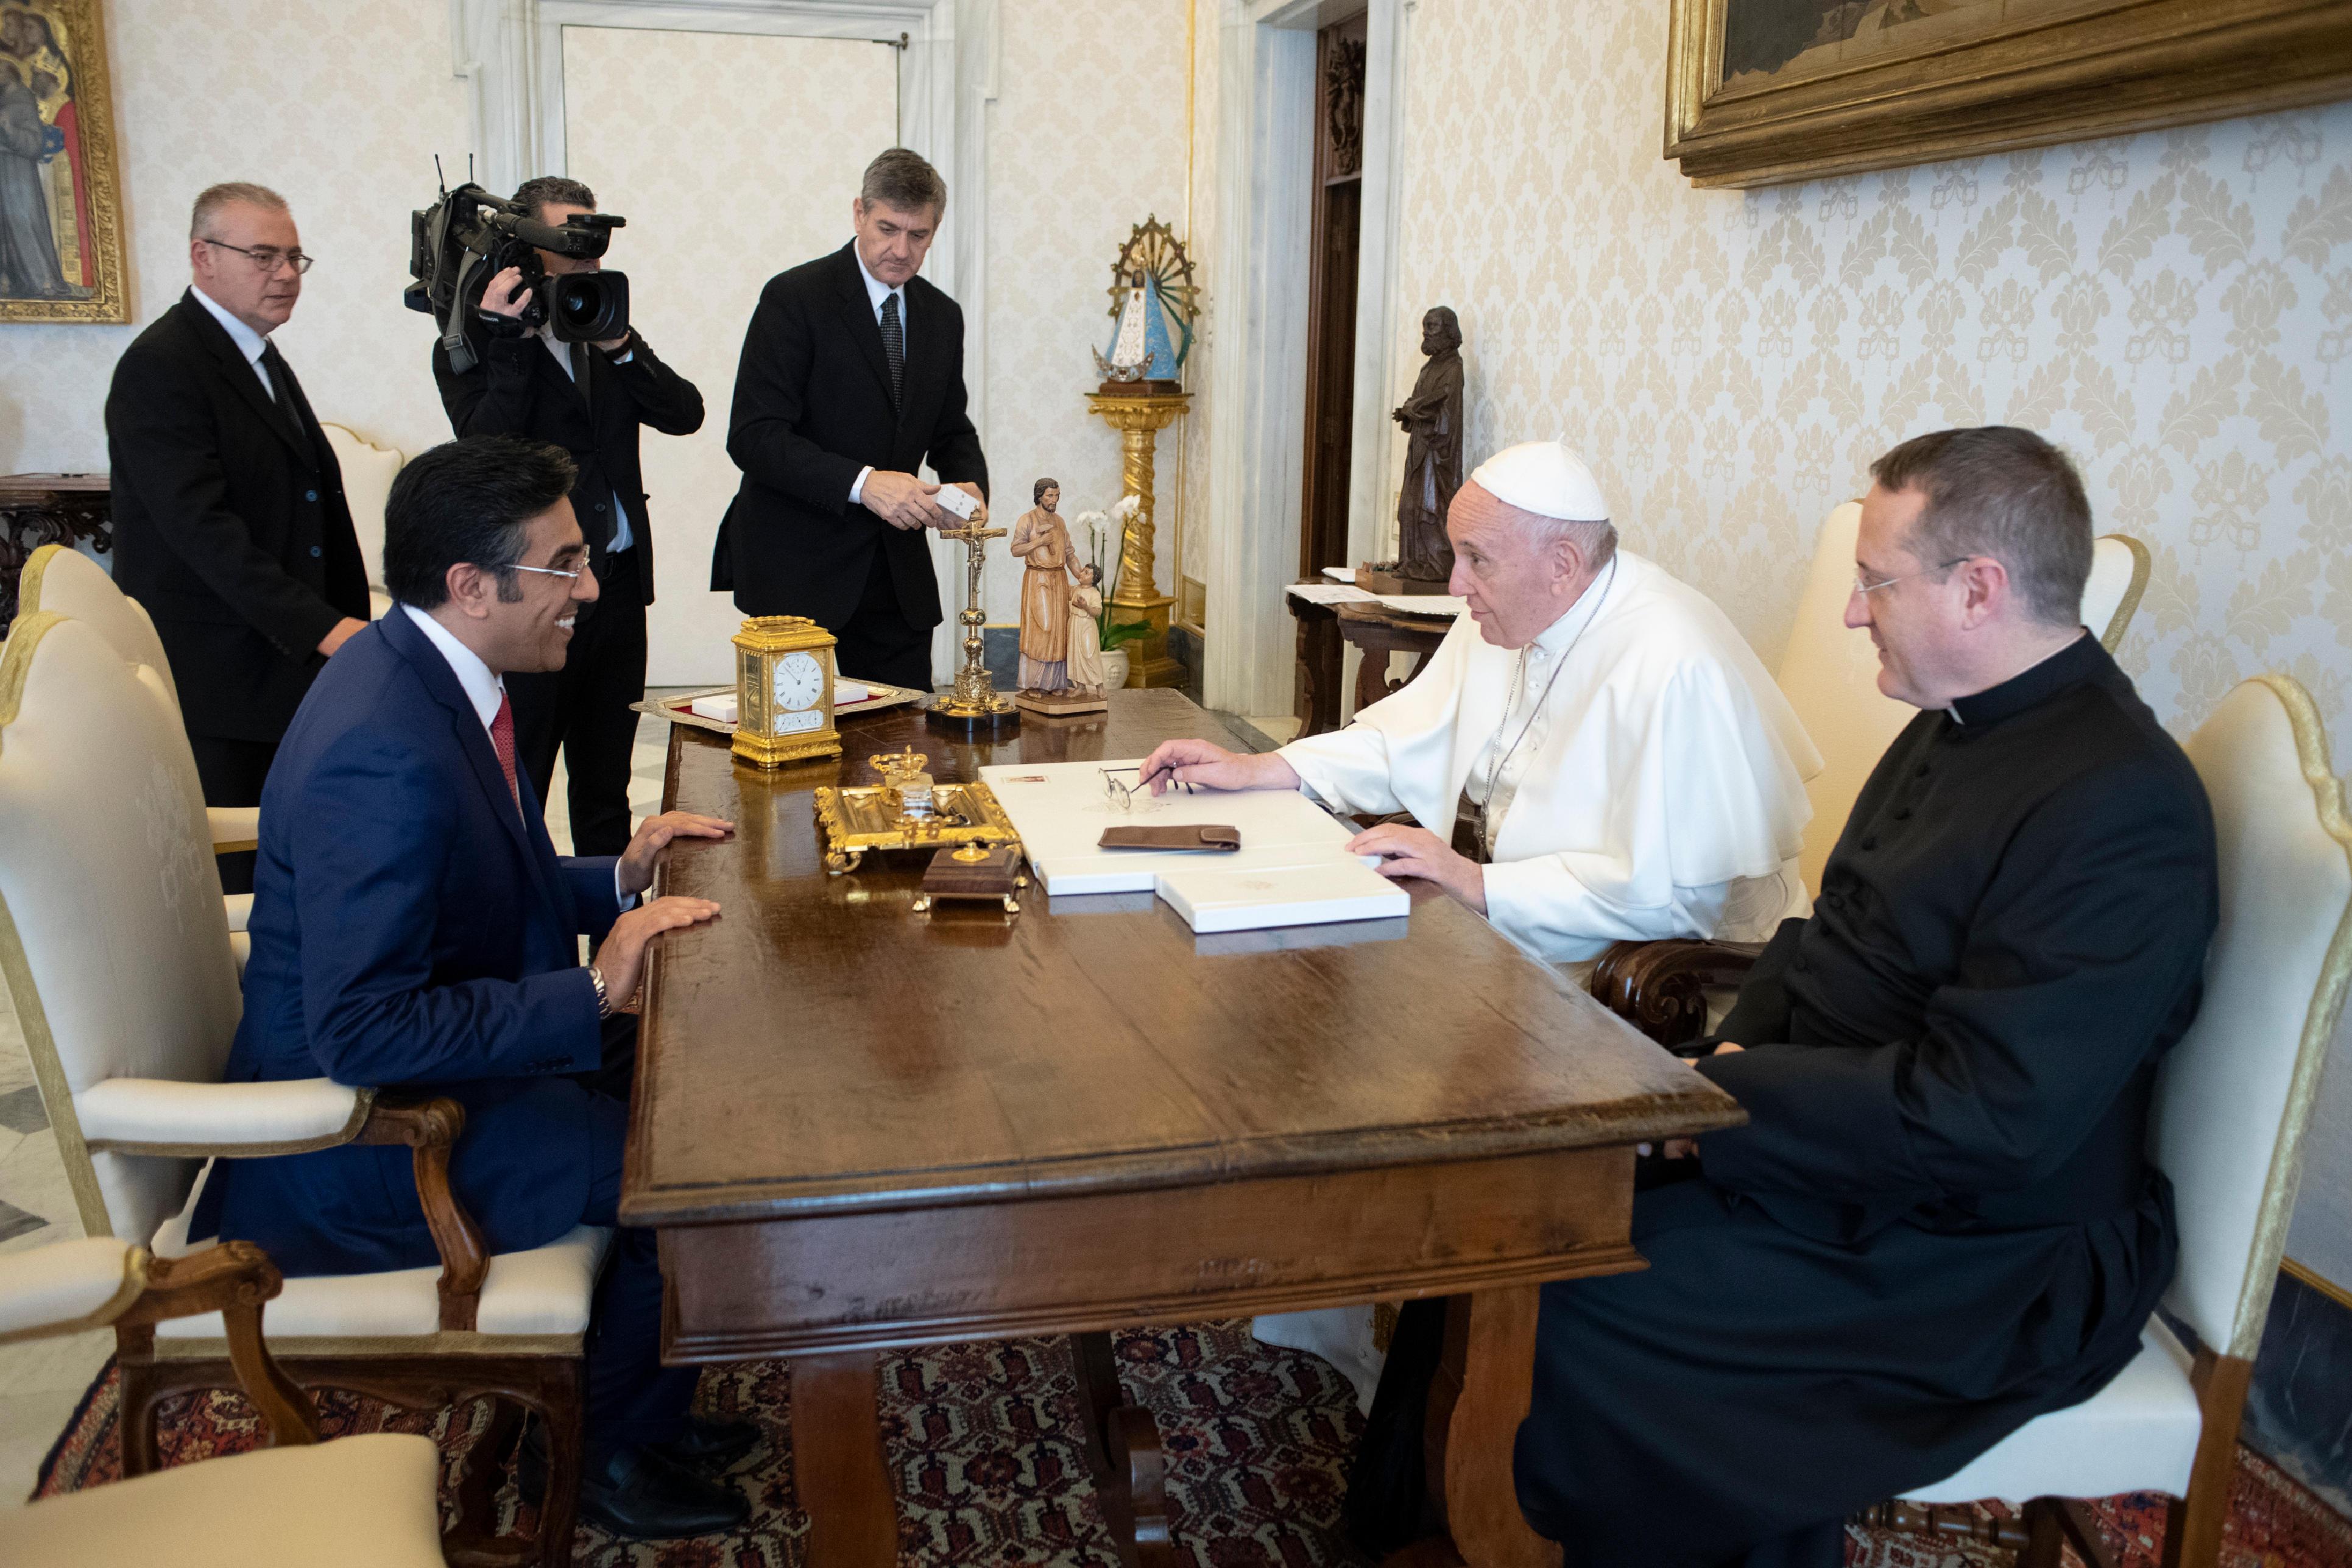 Ali Bin Smaikh Al Marri, Presidente de NHRC, Qatar© Vatican Media